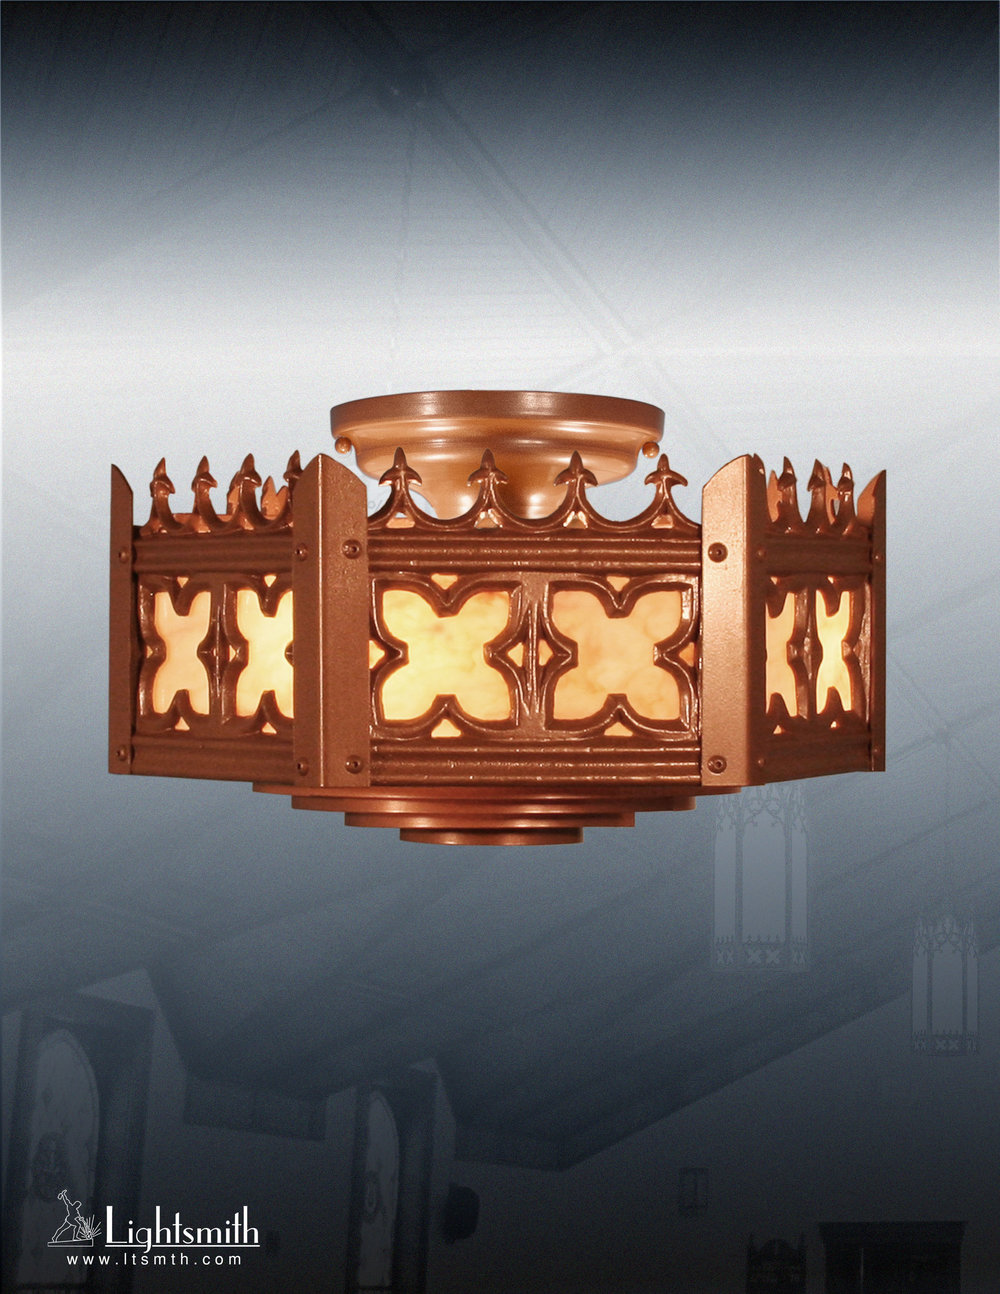 10116-CT - Medium Bronze - Natural Horn Acrylic